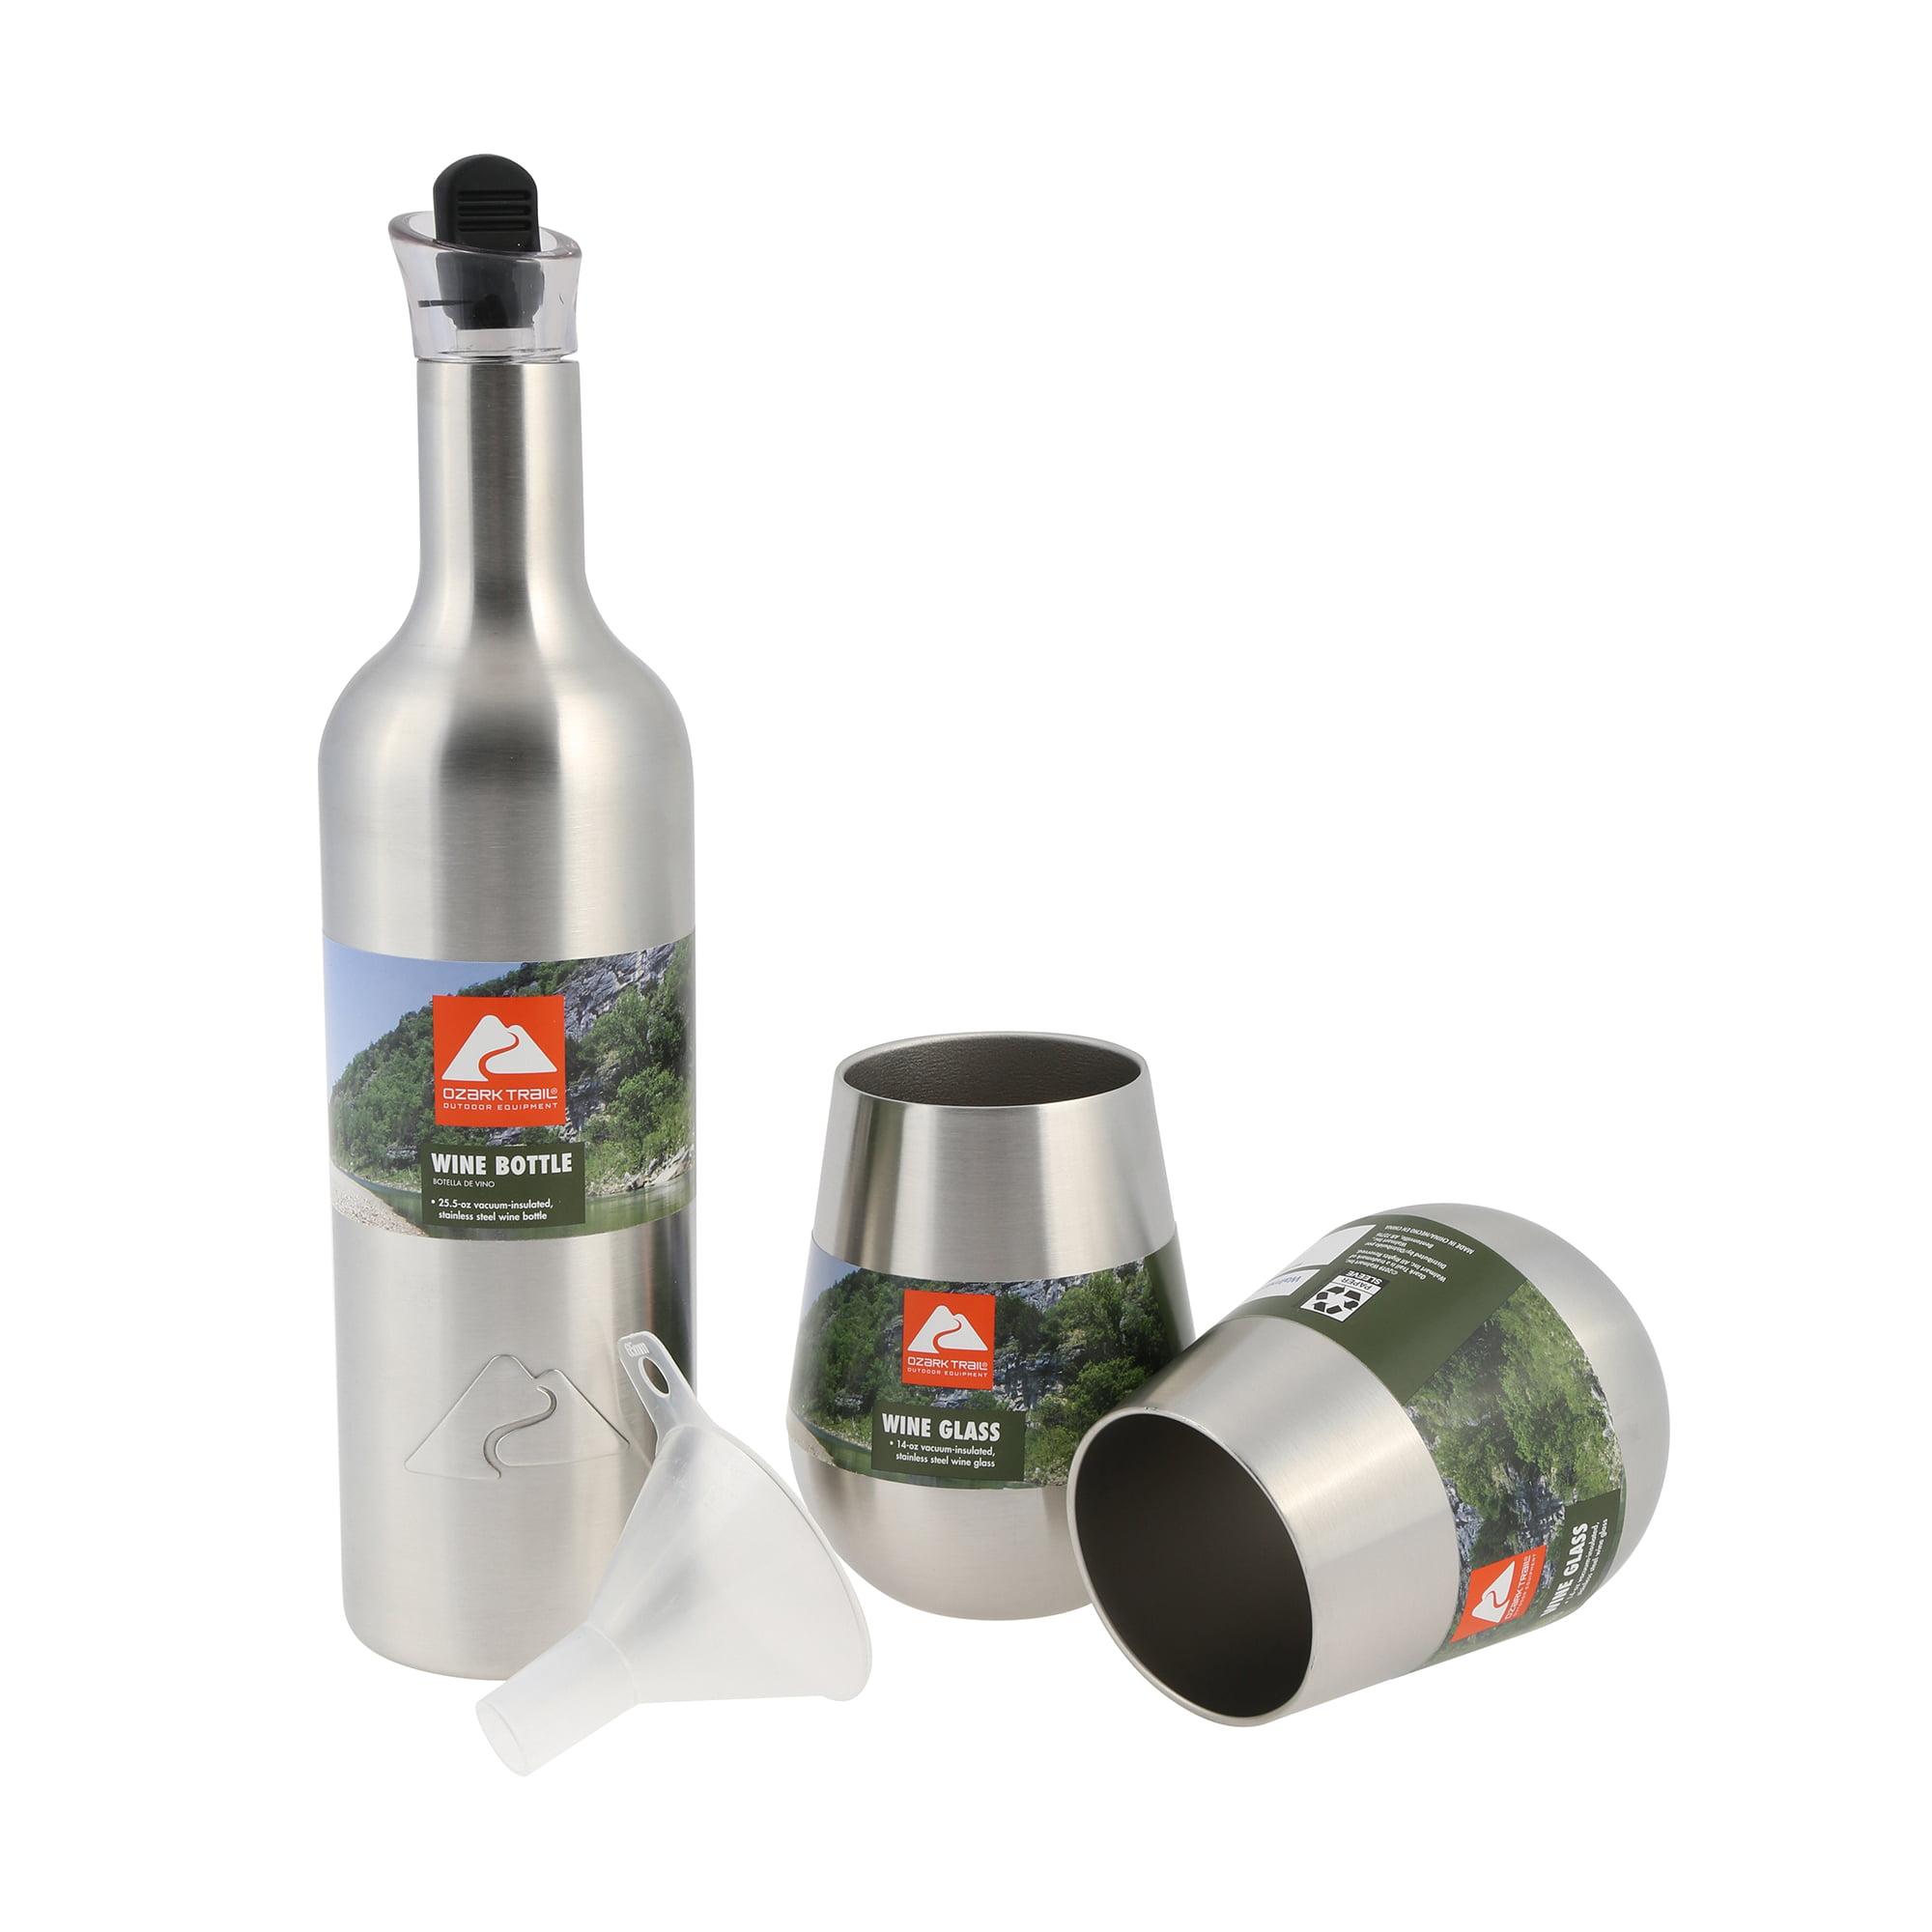 Ozark Trail Wine Bottle and Glass Set, 3 Pieces - Walmart.com